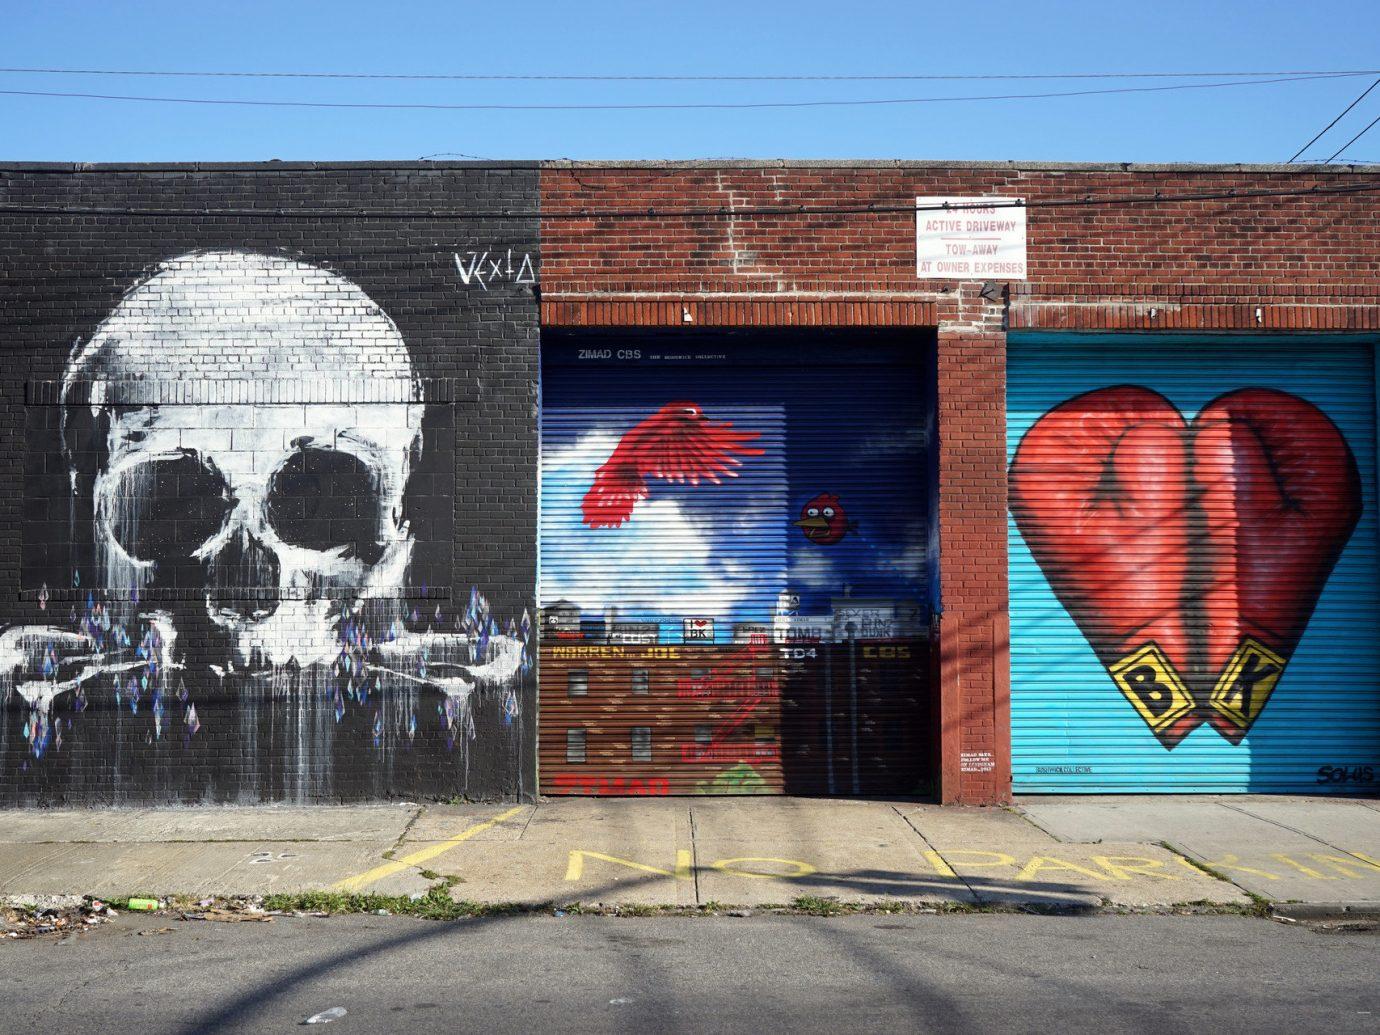 art Arts + Culture brick wall City city streets graffiti street art streets Trip Ideas urban building outdoor sky color urban area road mural wall street neighbourhood infrastructure painted